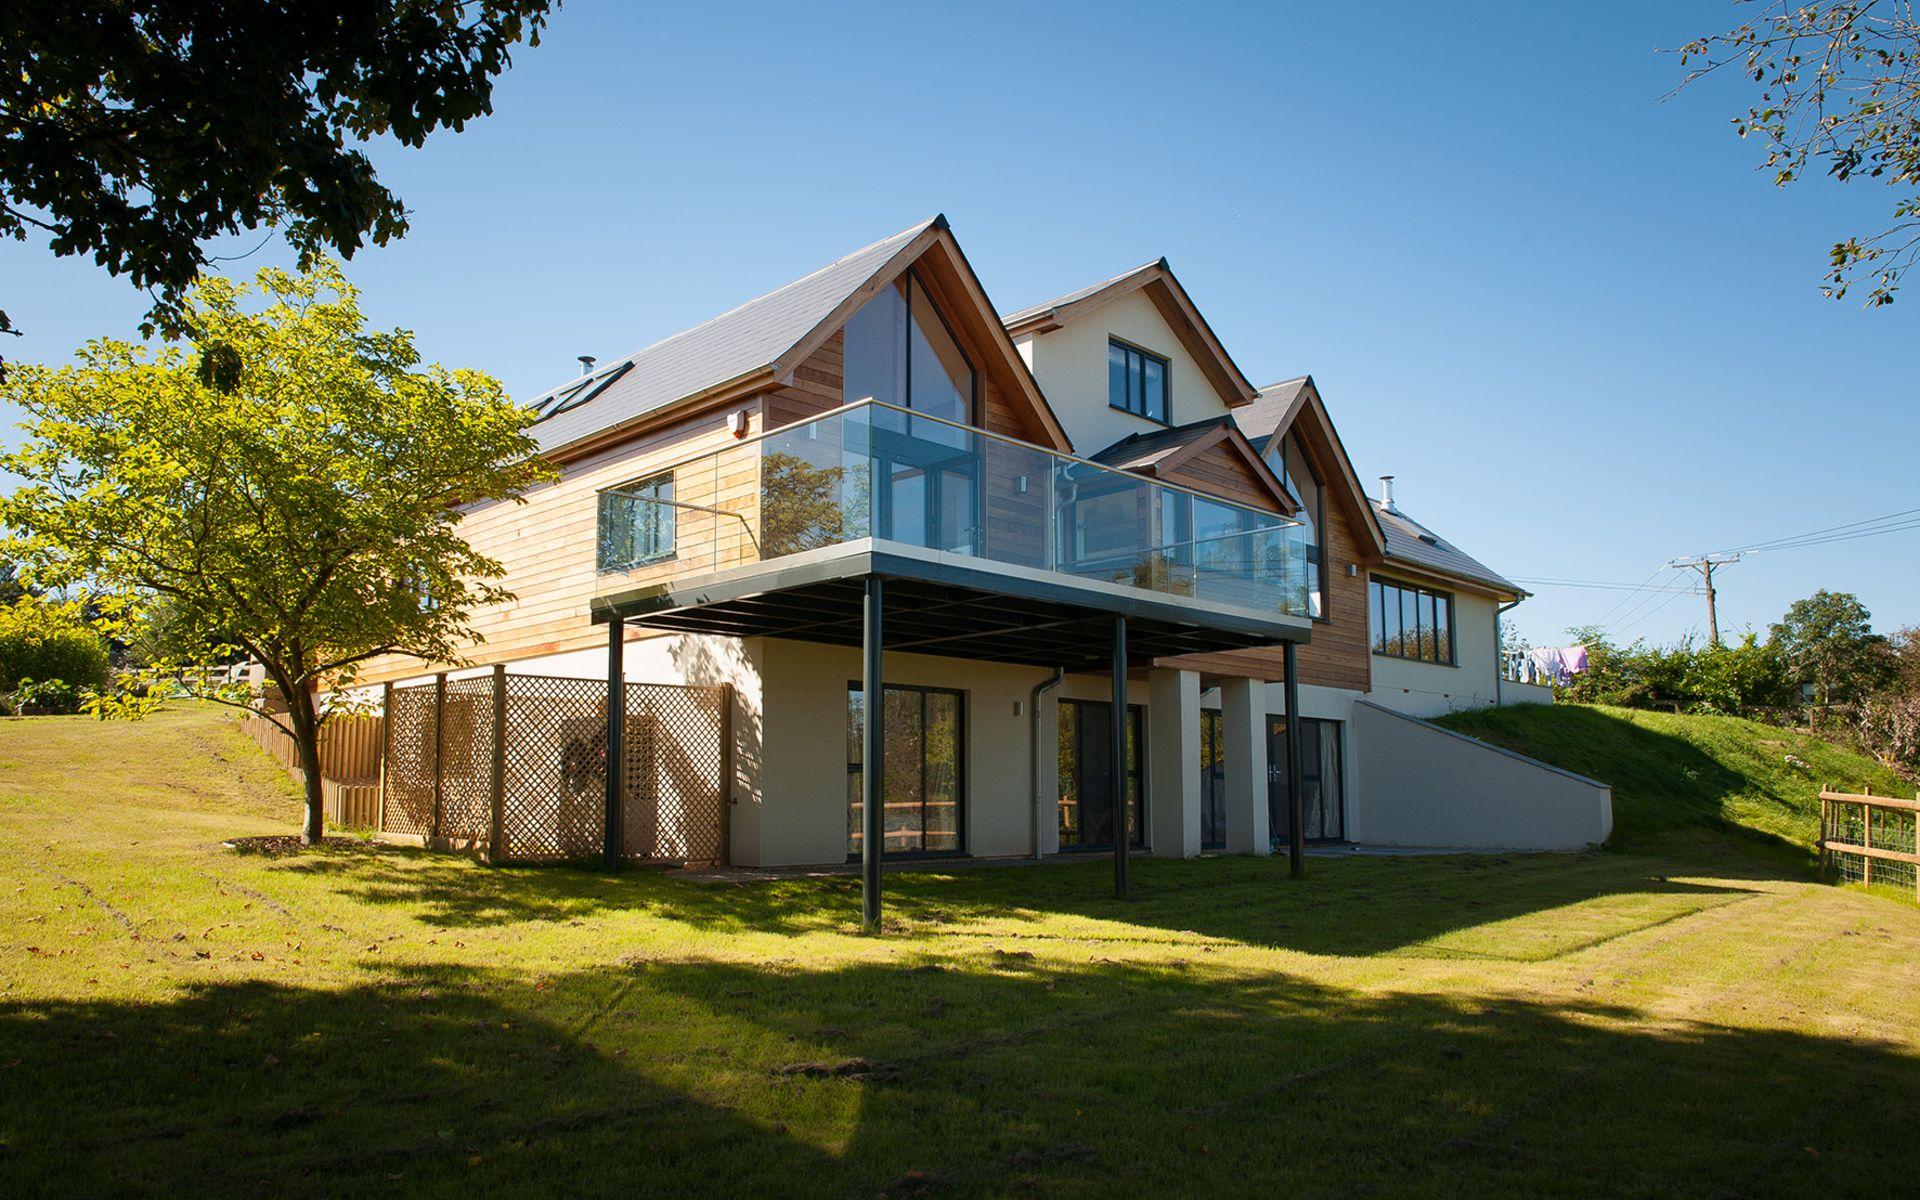 Oxfordshire Gloucestershire Building Project Management Services eco homes